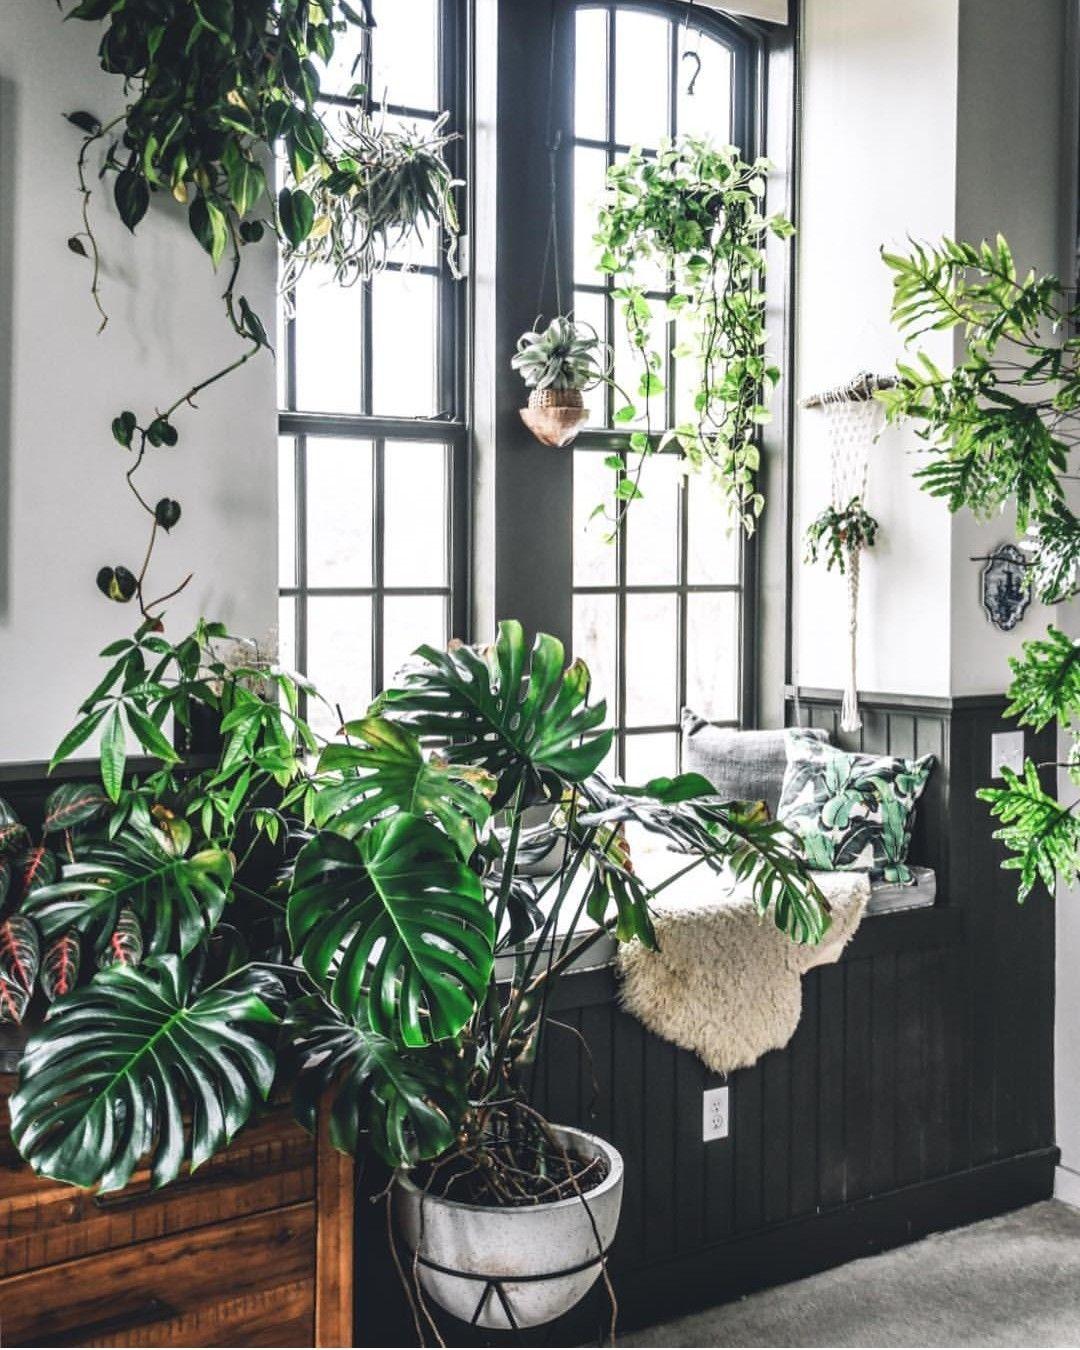 Urban Jungle Boho Home Decor Design Indoor Plants Plants